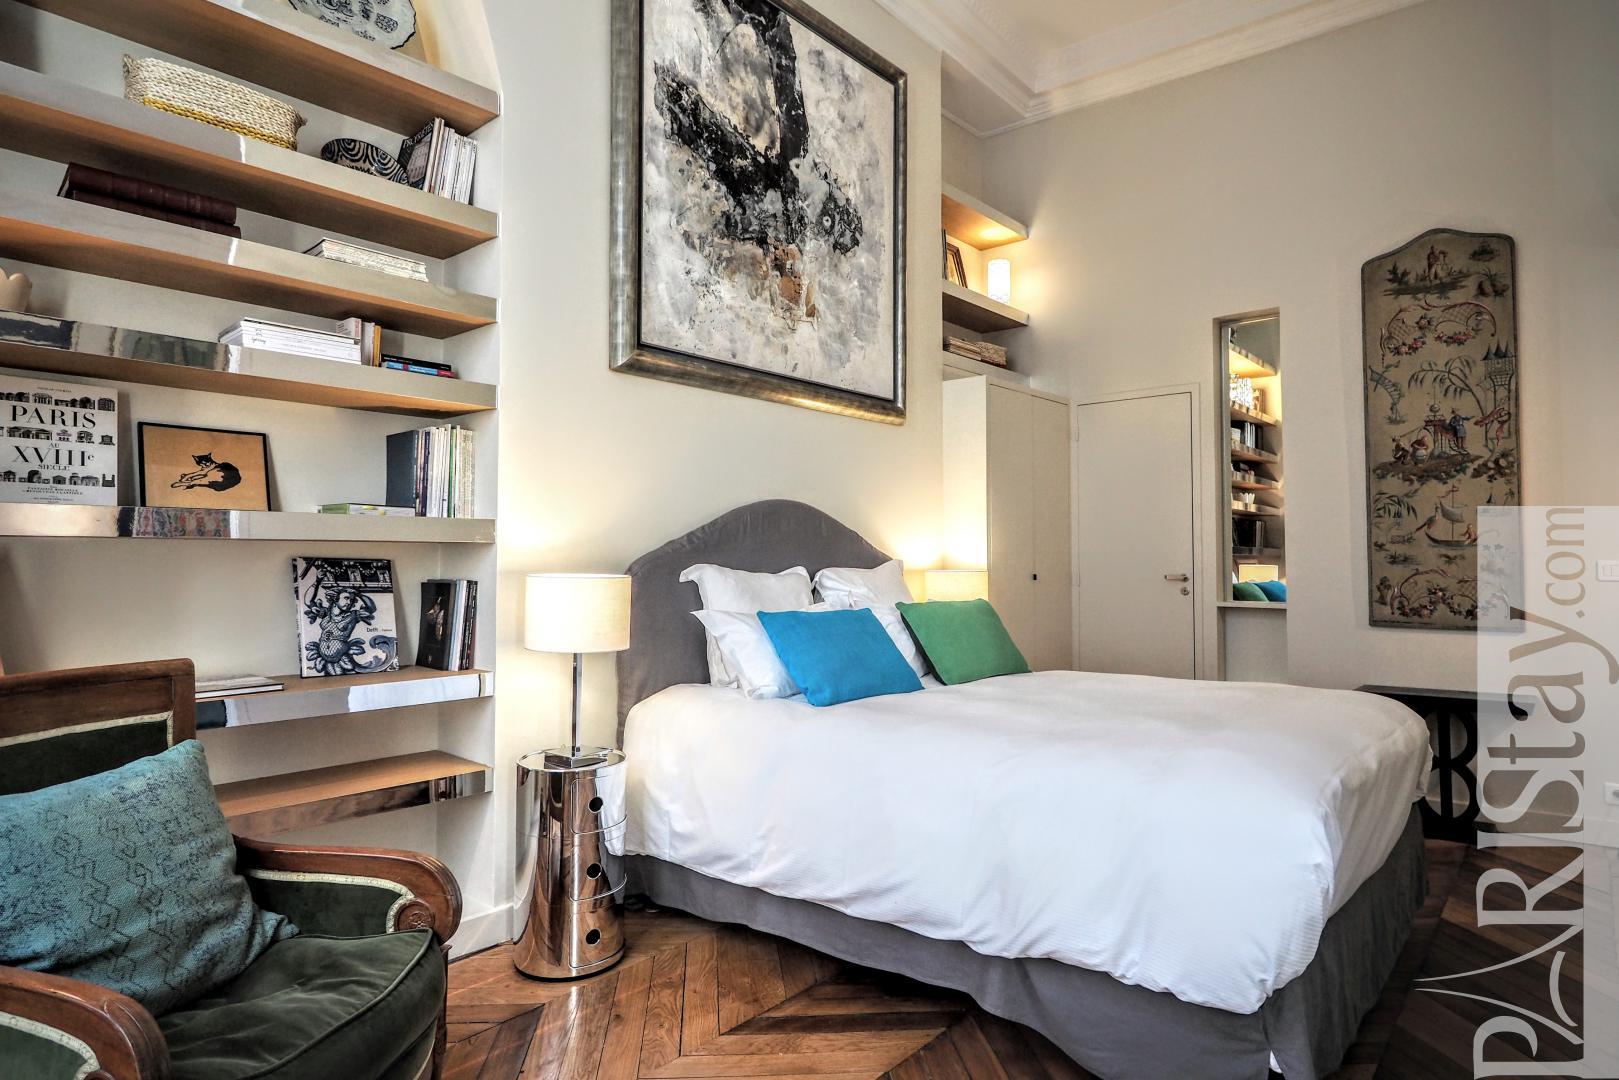 Apartment rentals paris france Louvre 2 bedroom vacation ...